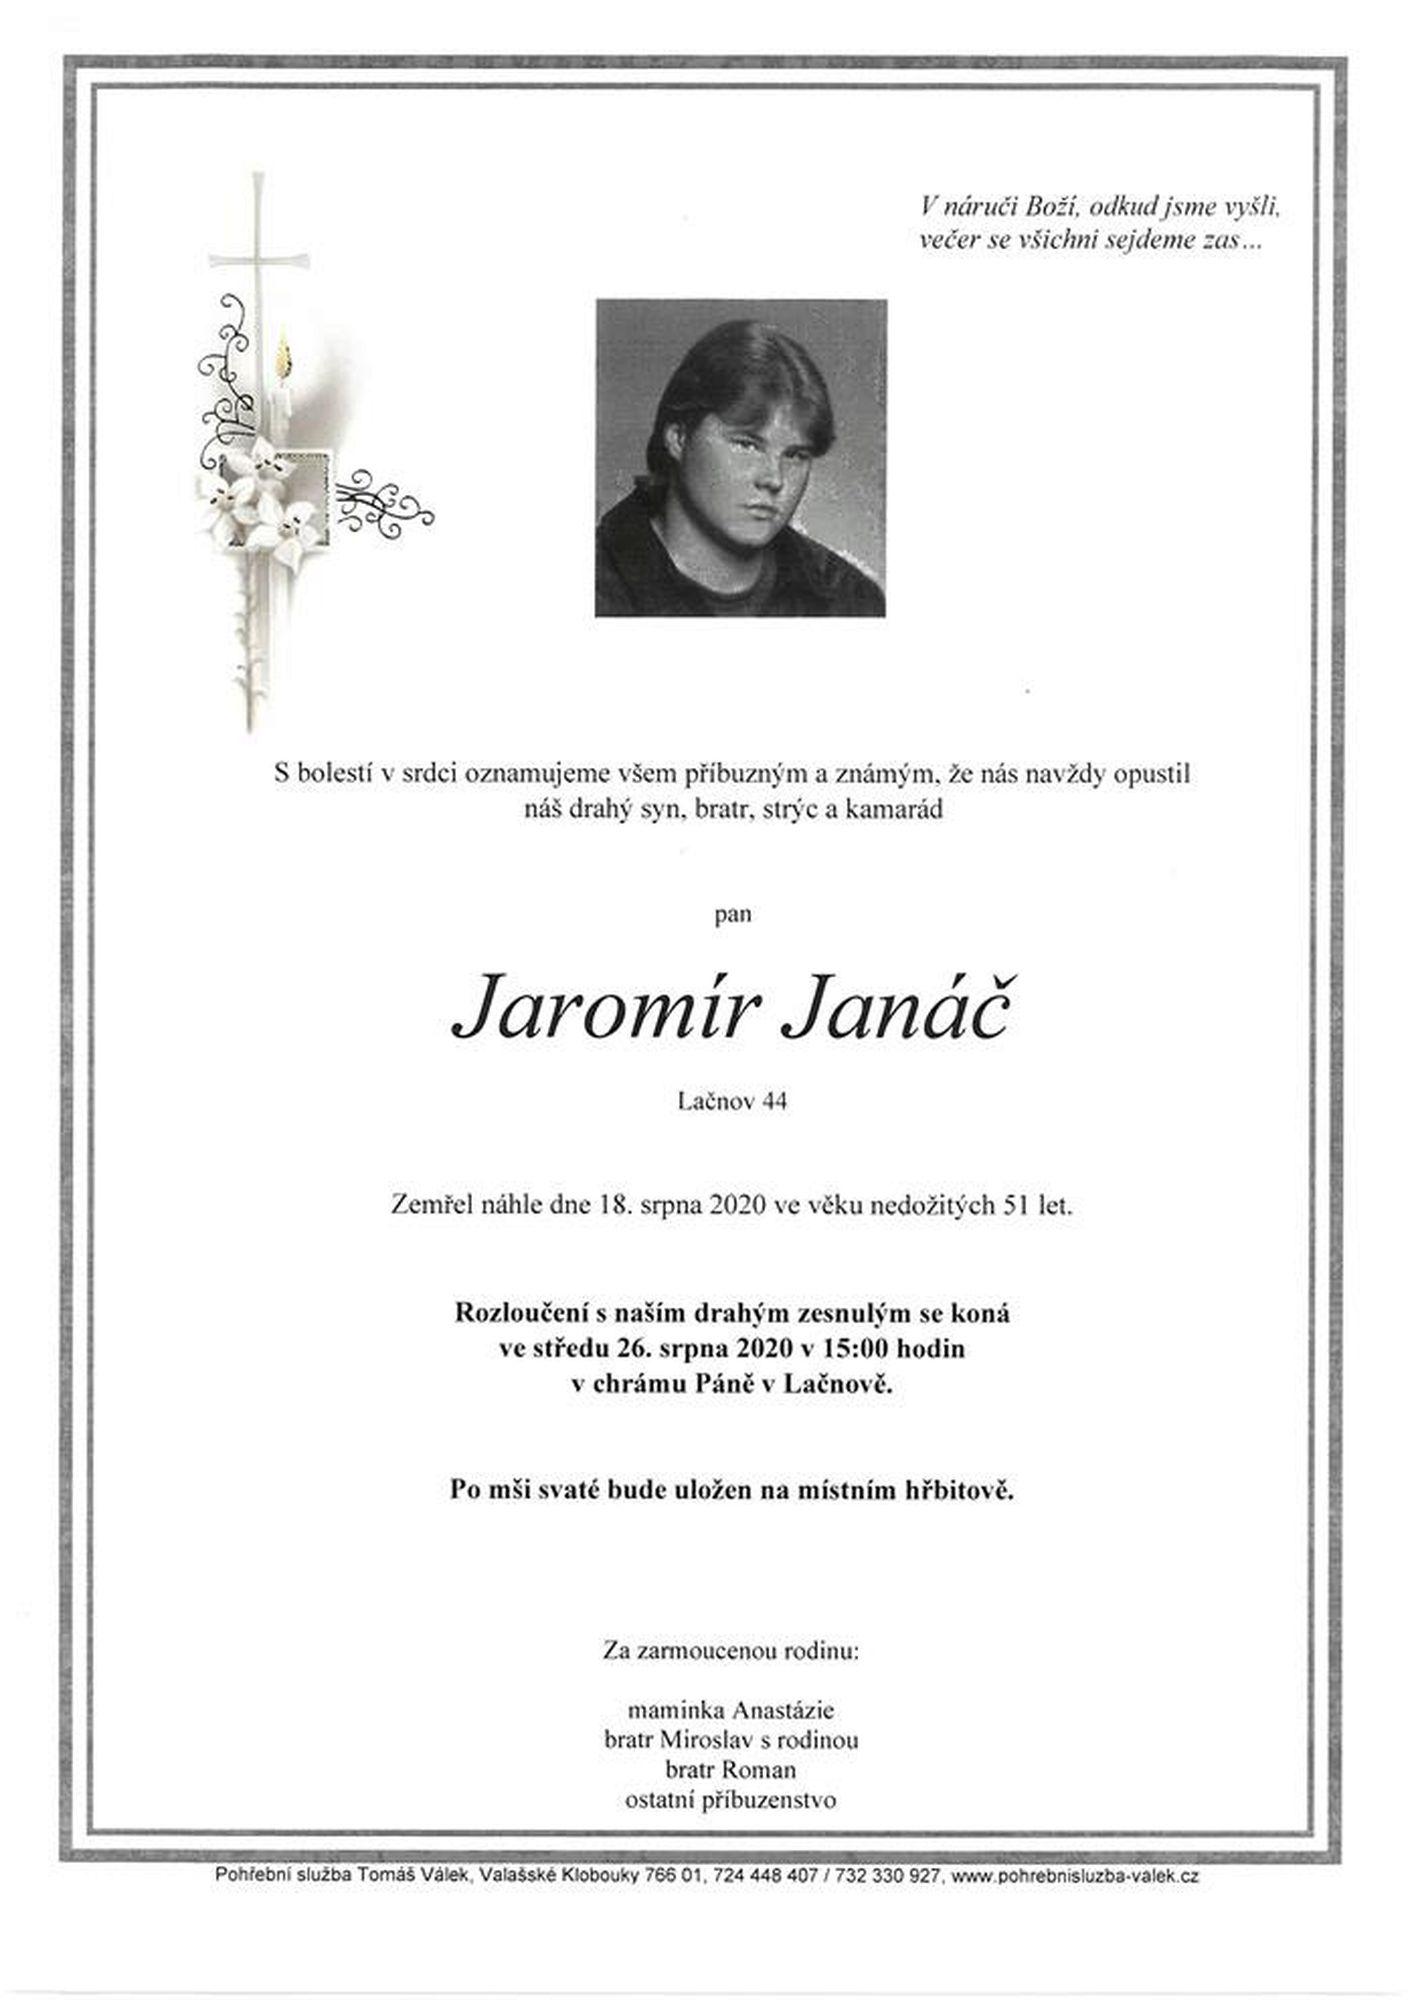 Jaromír Janáč